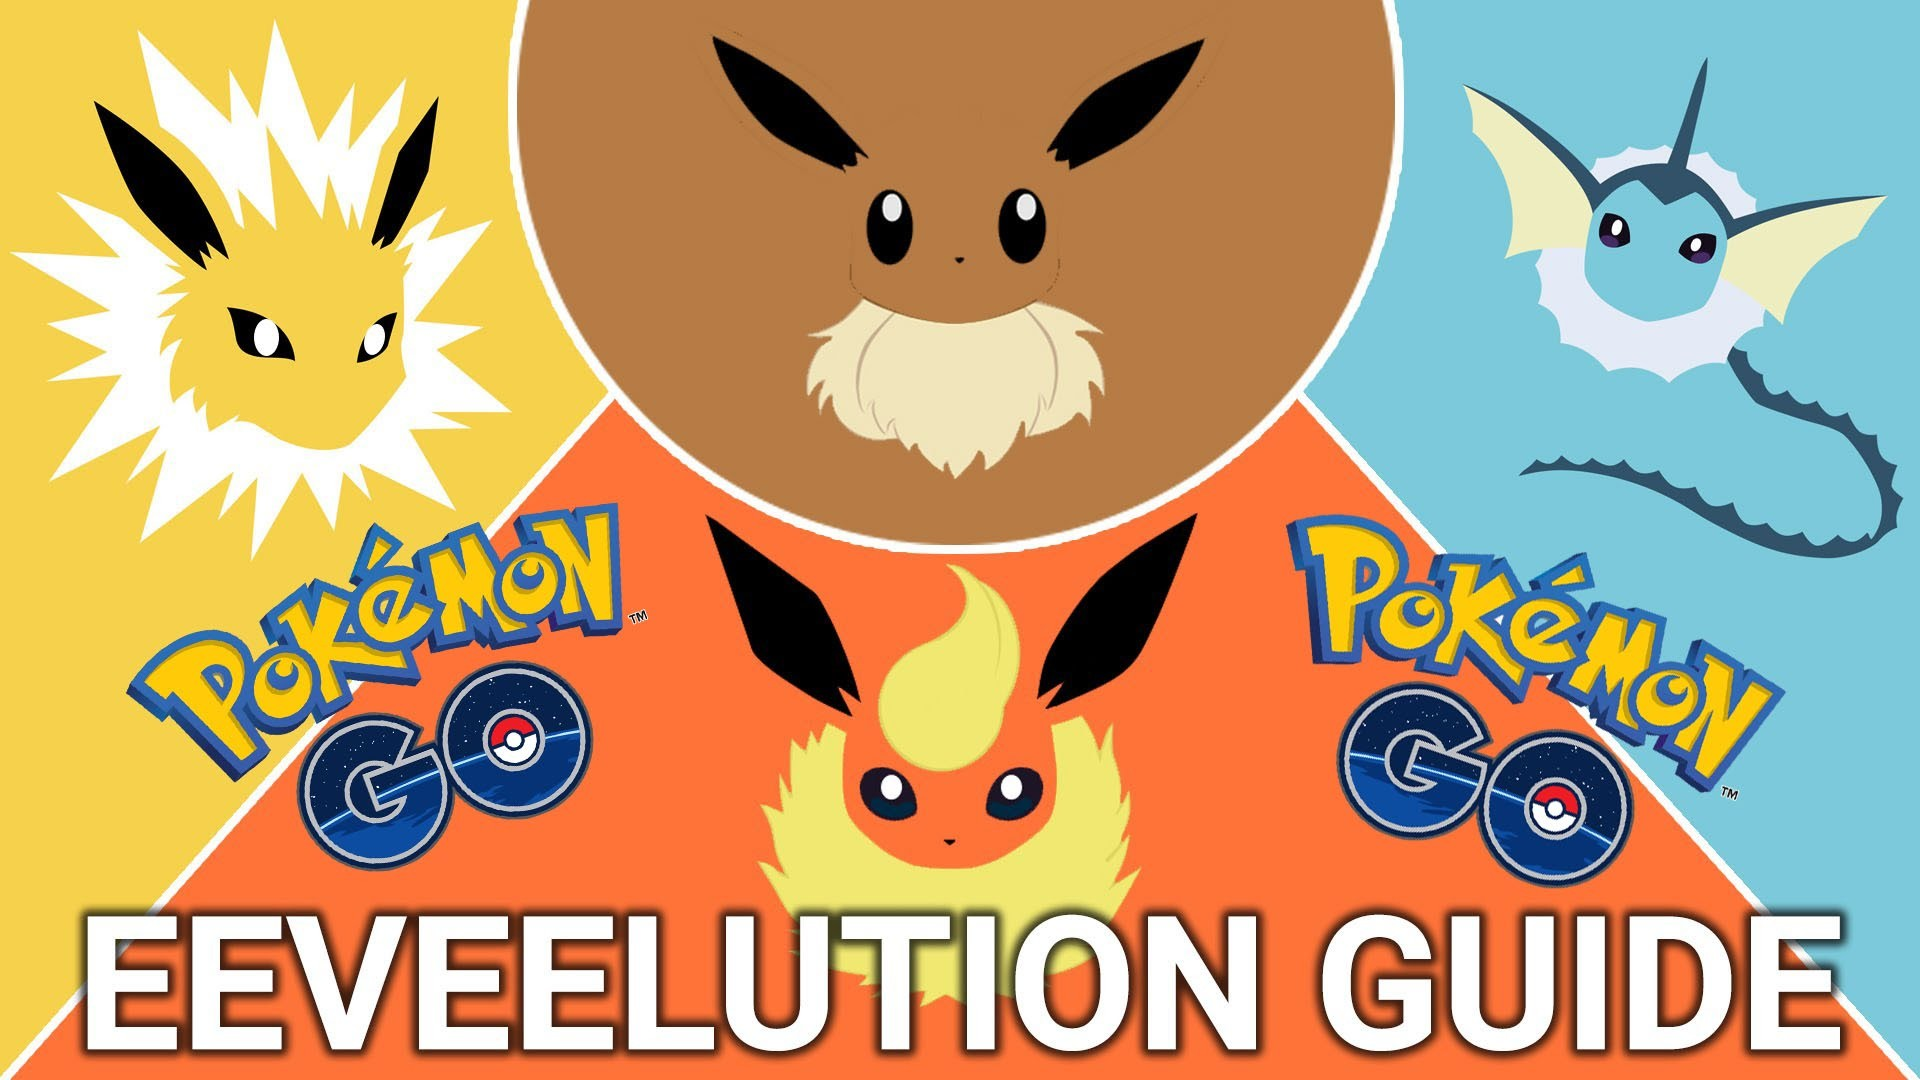 CONFIRMED: How to Evolve Eevee into (Vaporeon, Flareon or Jolteon) |  Pokemon GO Tips & Tricks